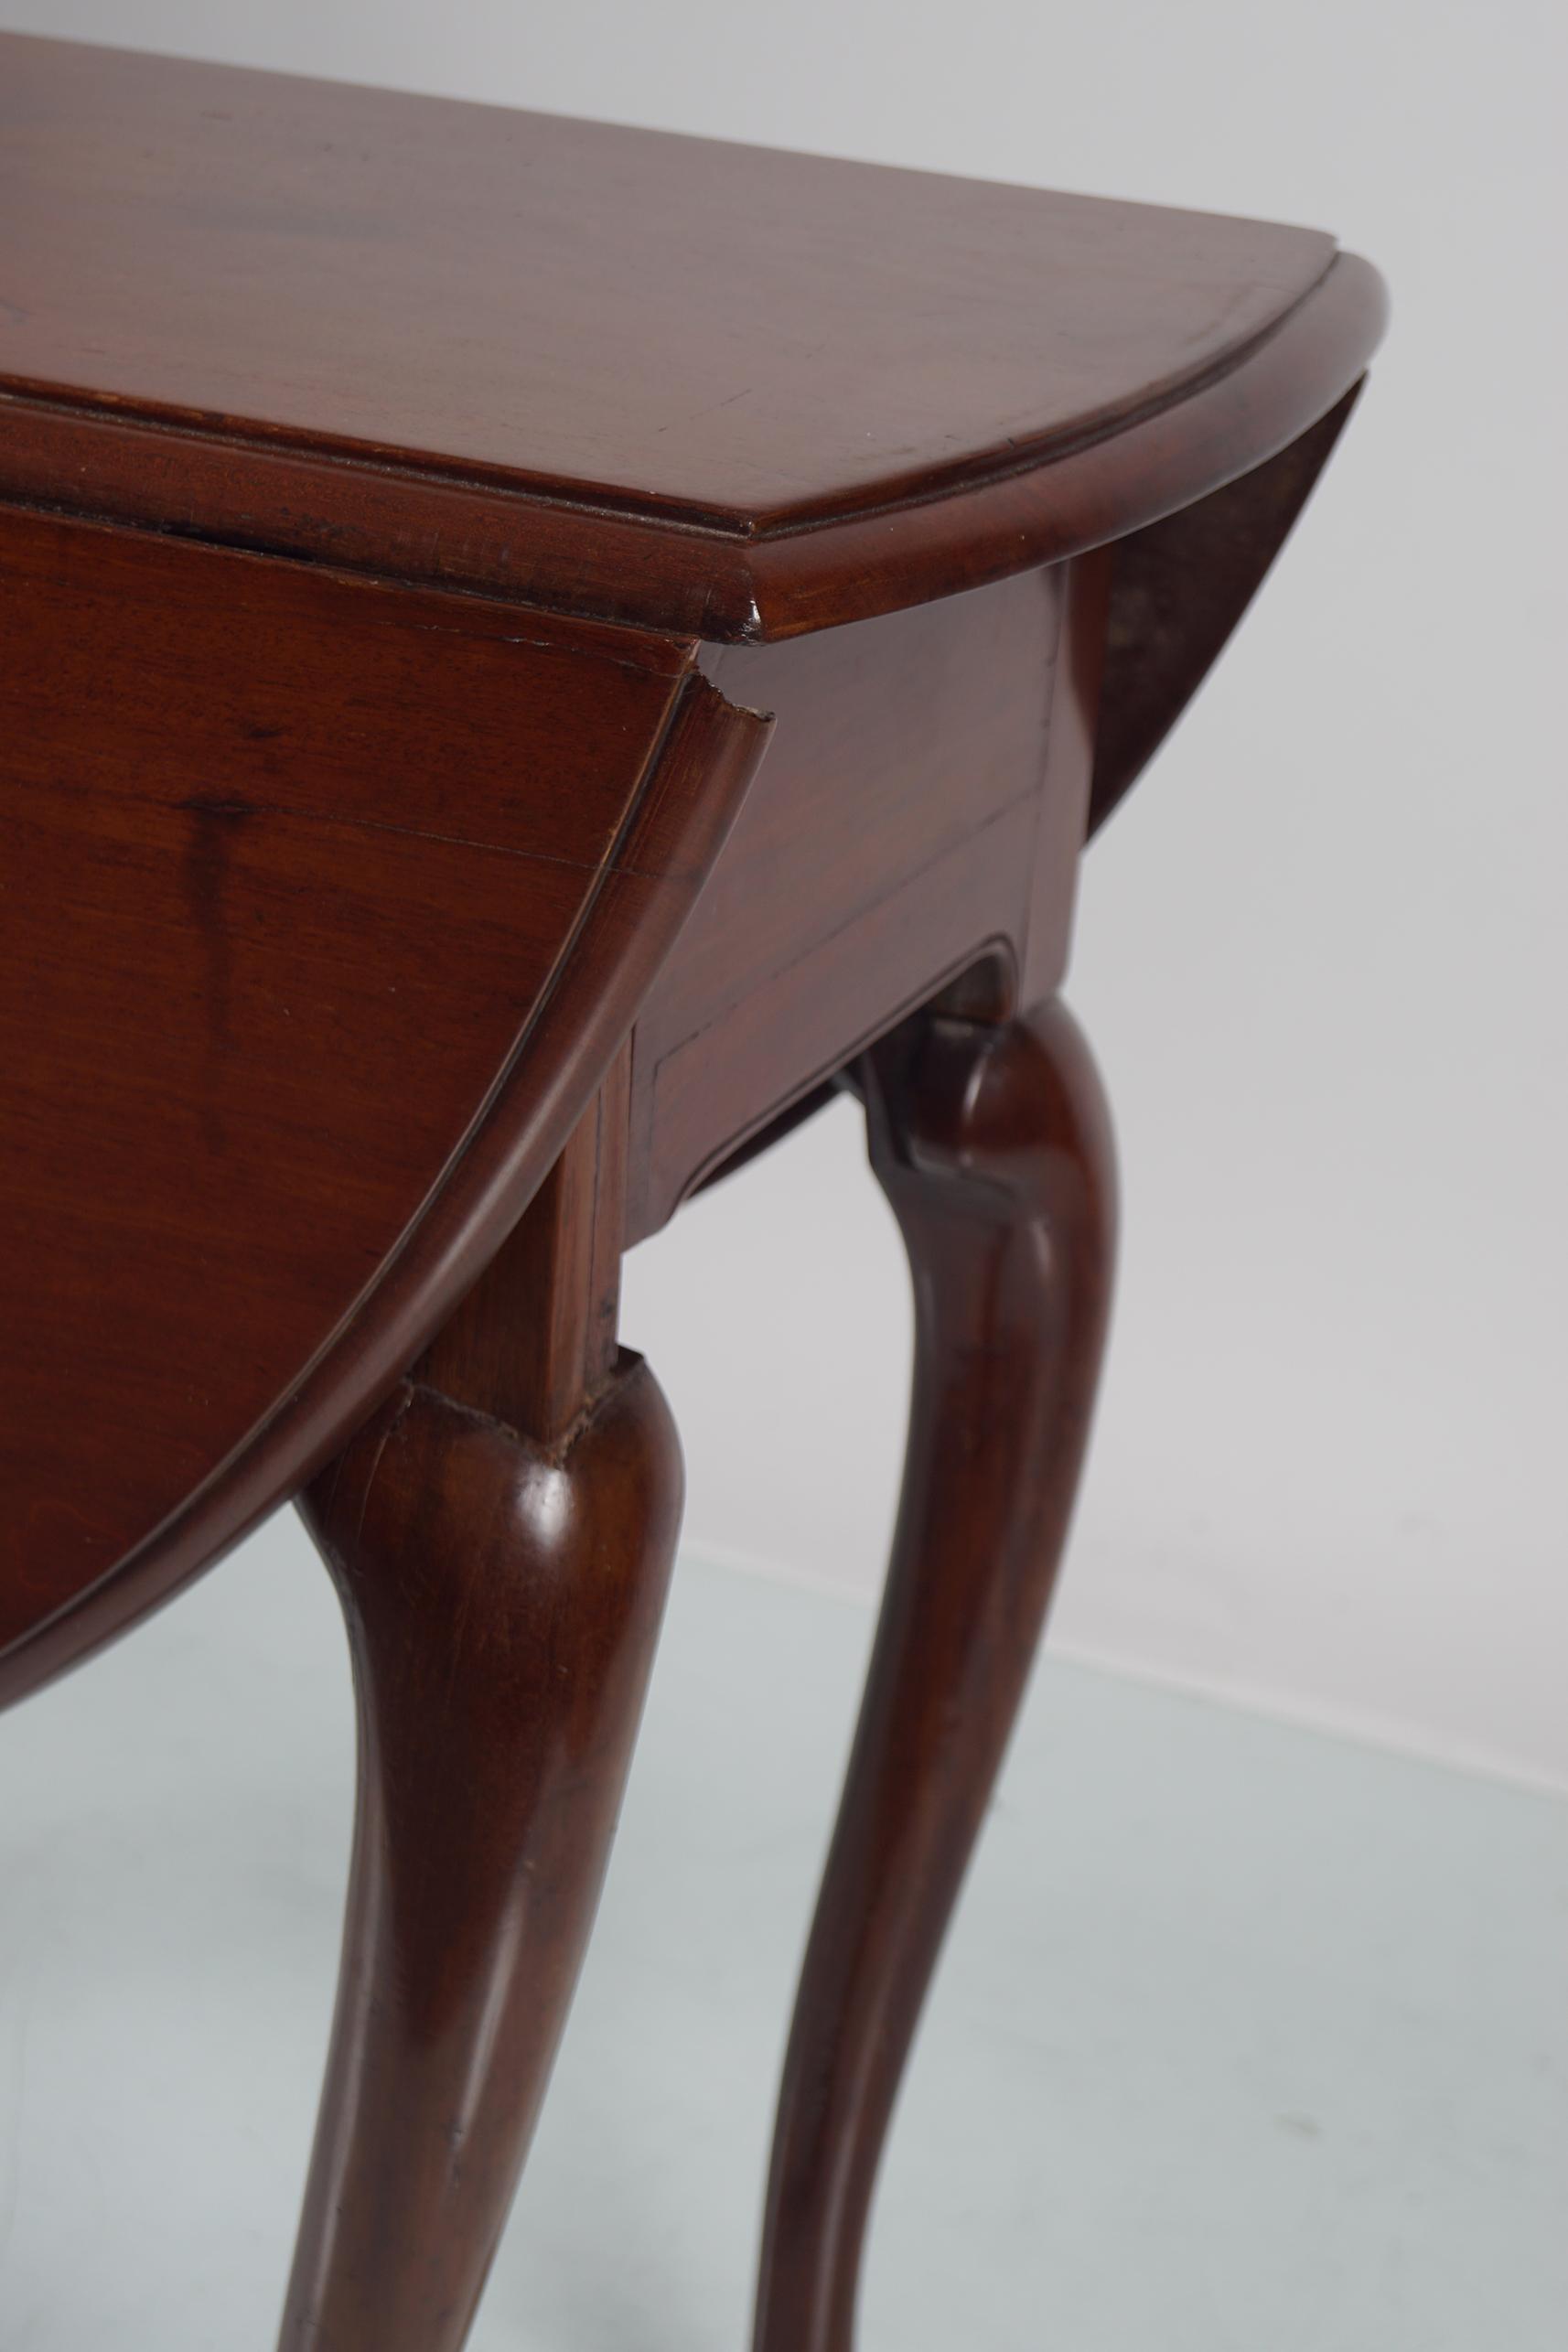 GEORGE II RED WALNUT GATE LEG TABLE - Image 3 of 5